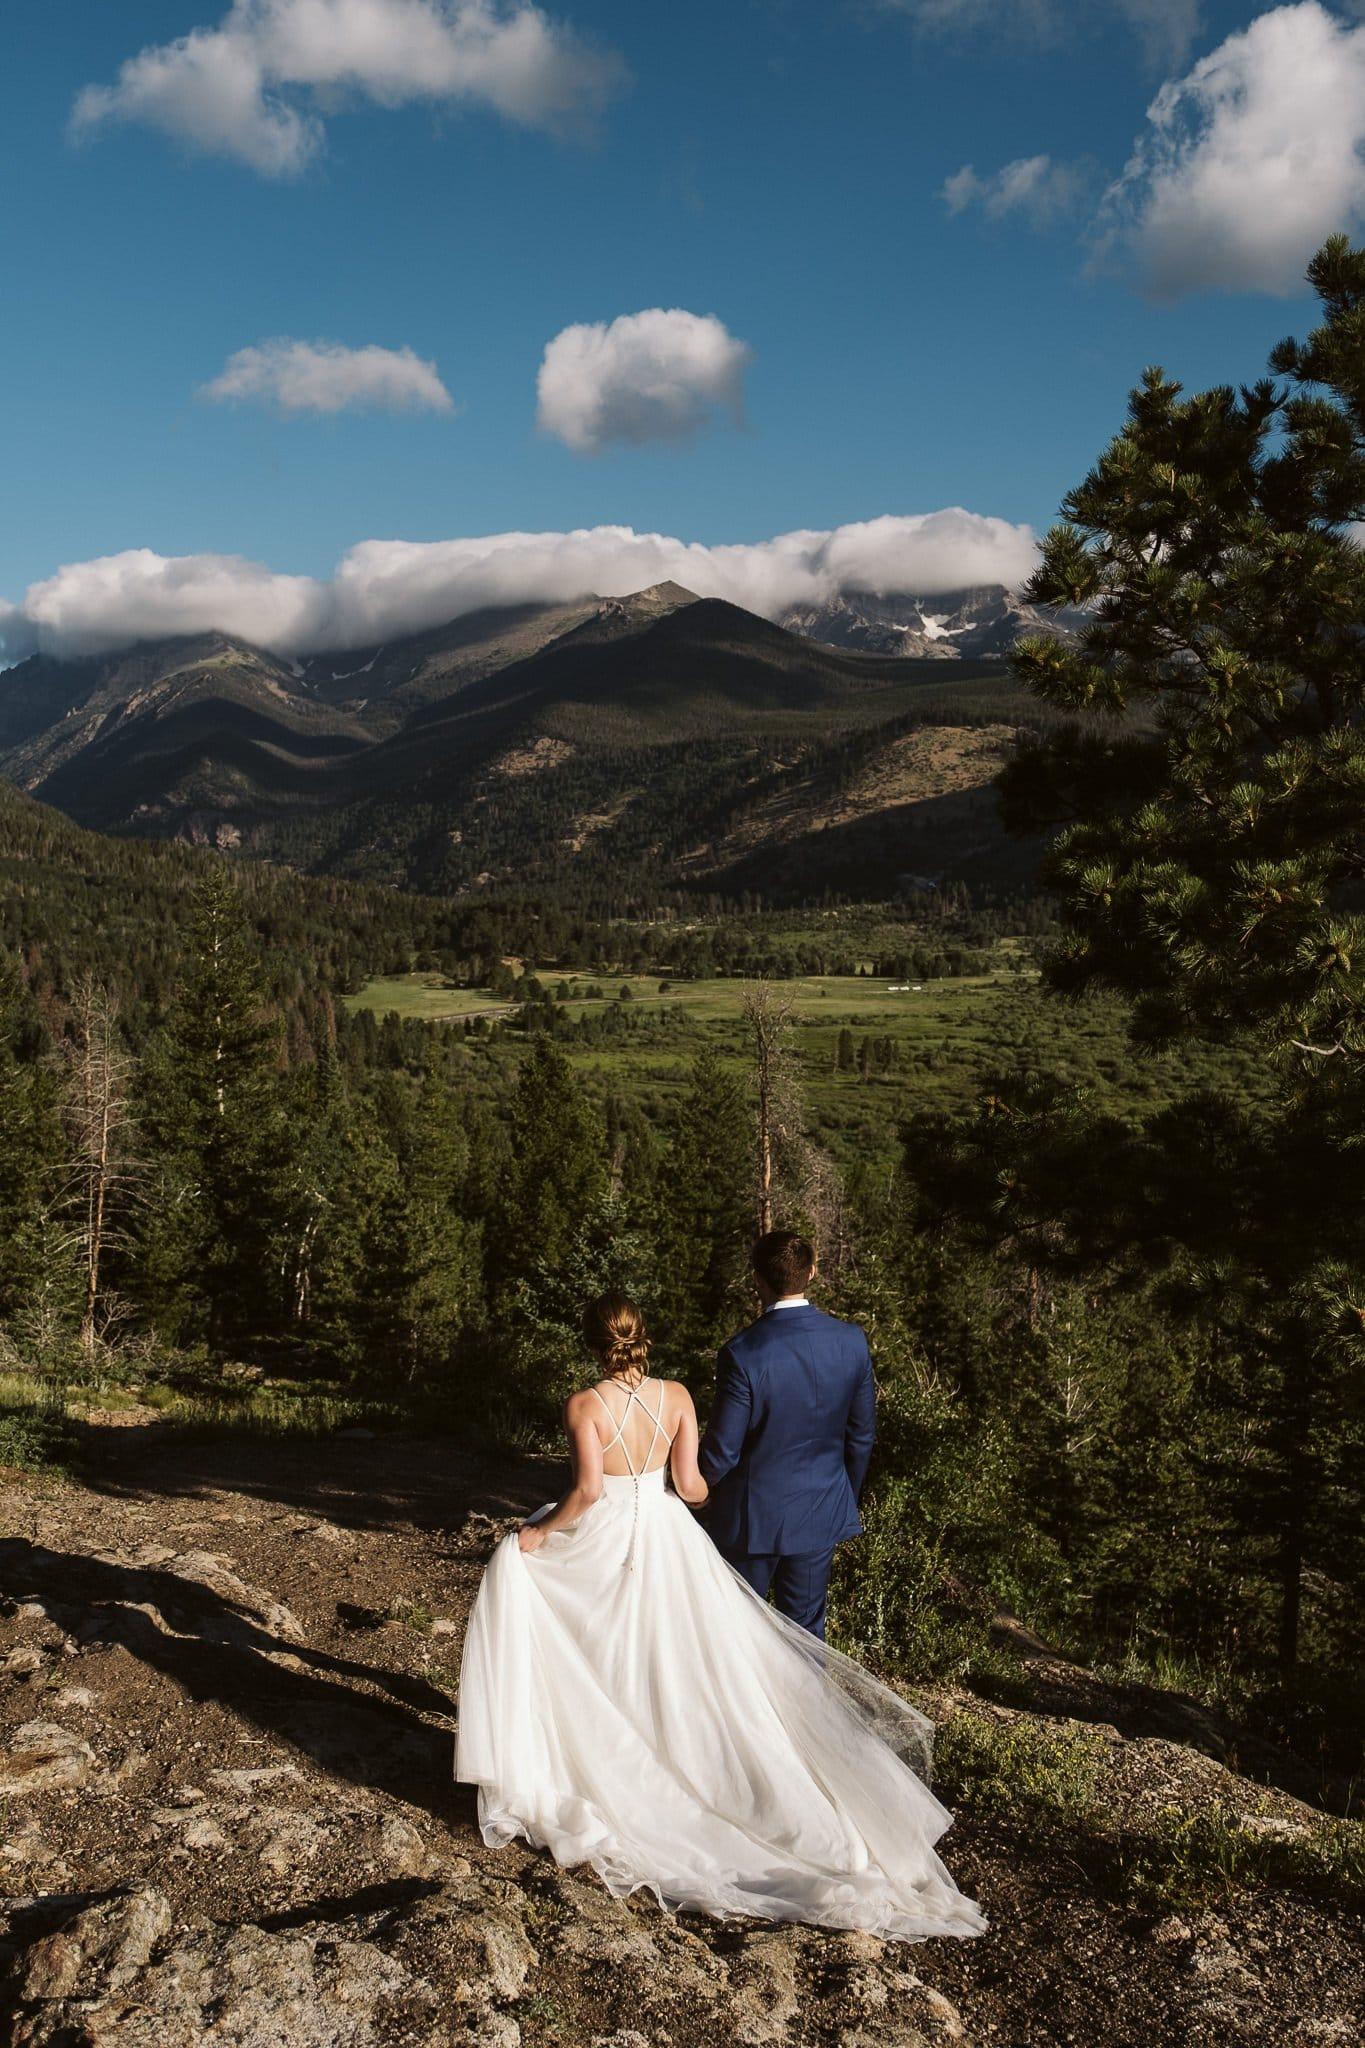 Adventure hiking elopement in the Rocky Mountains, Colorado elopement photographer, adventure wedding